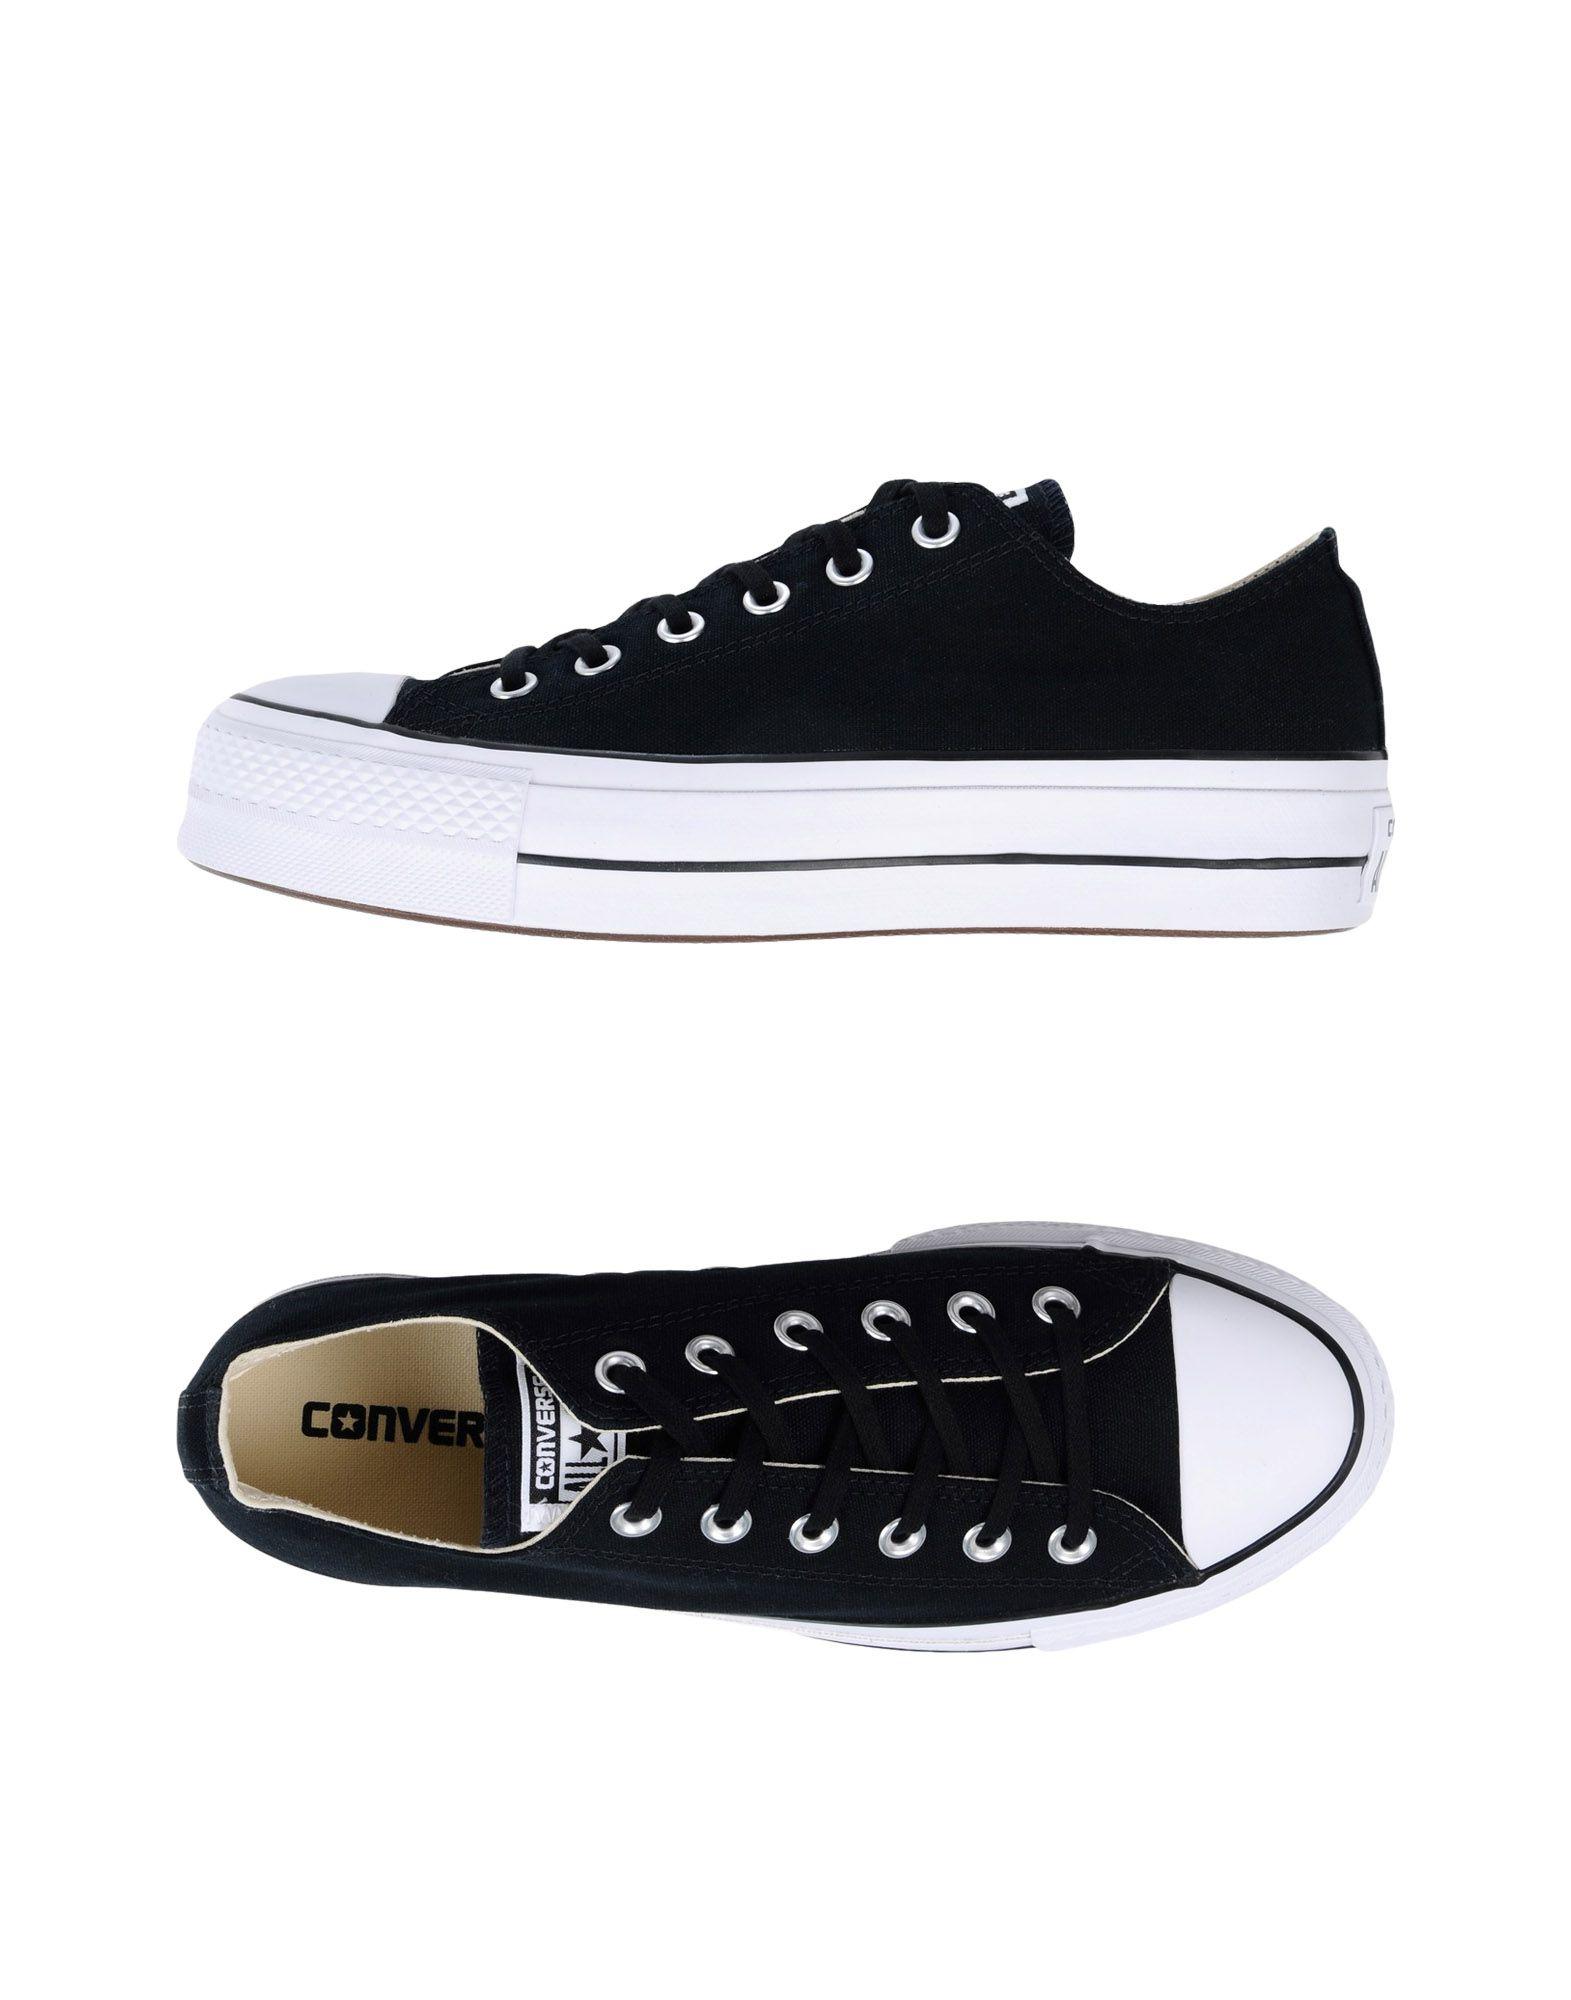 Sneakers Converse All Star Ctas Clean Ox Lift Clean Ctas Core Canvas - Donna - 11437559CV 4161c7